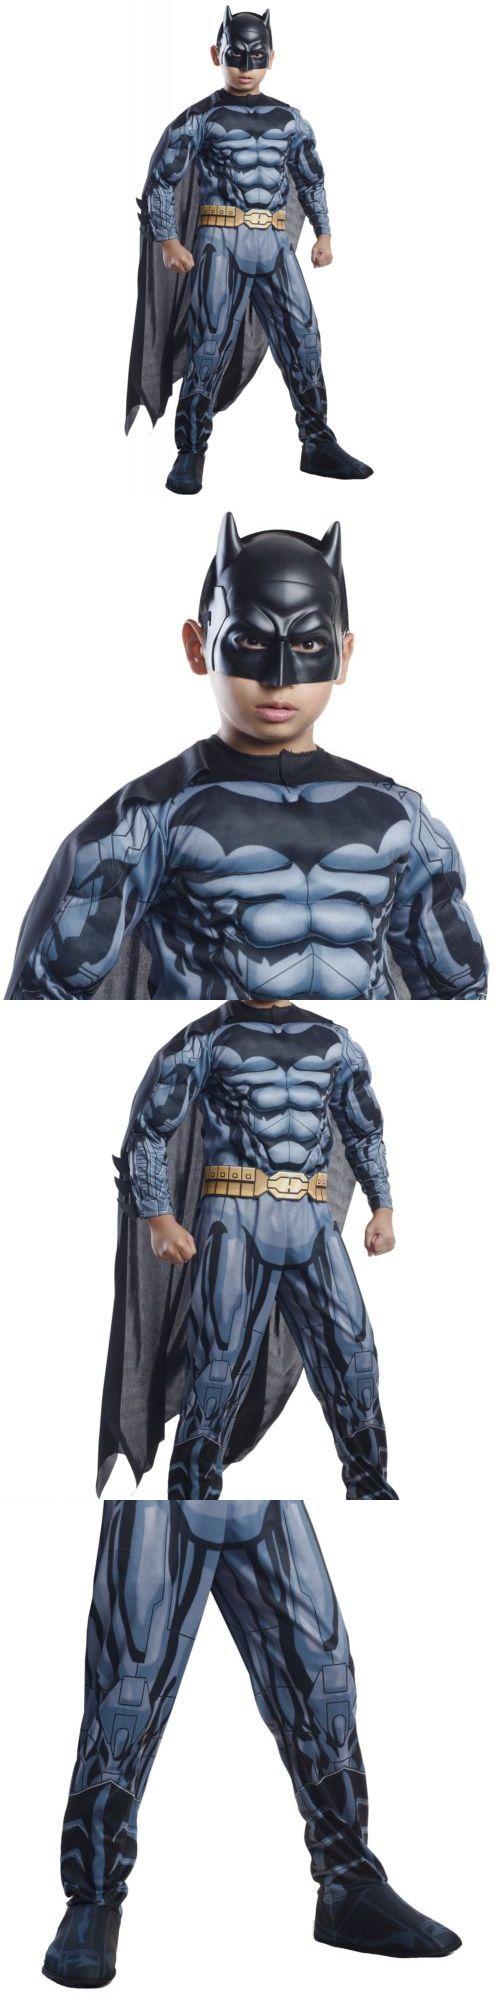 Best 25+ Batman costume for kids ideas on Pinterest | Batman ...